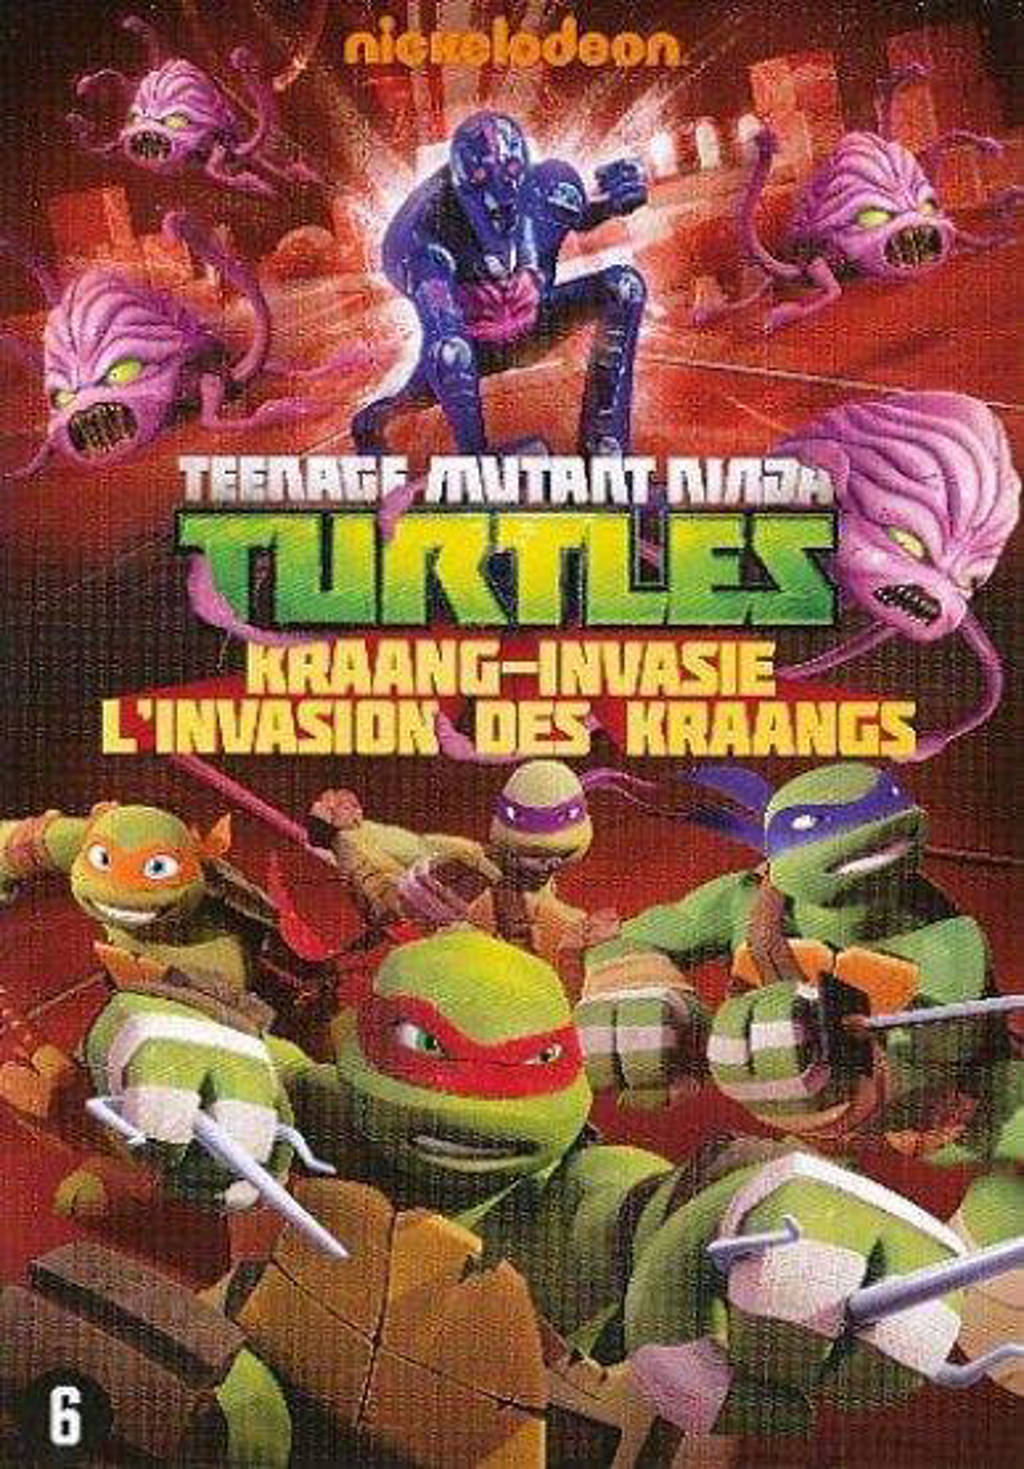 Teenage mutant ninja turtles - Kraang invasion (DVD)